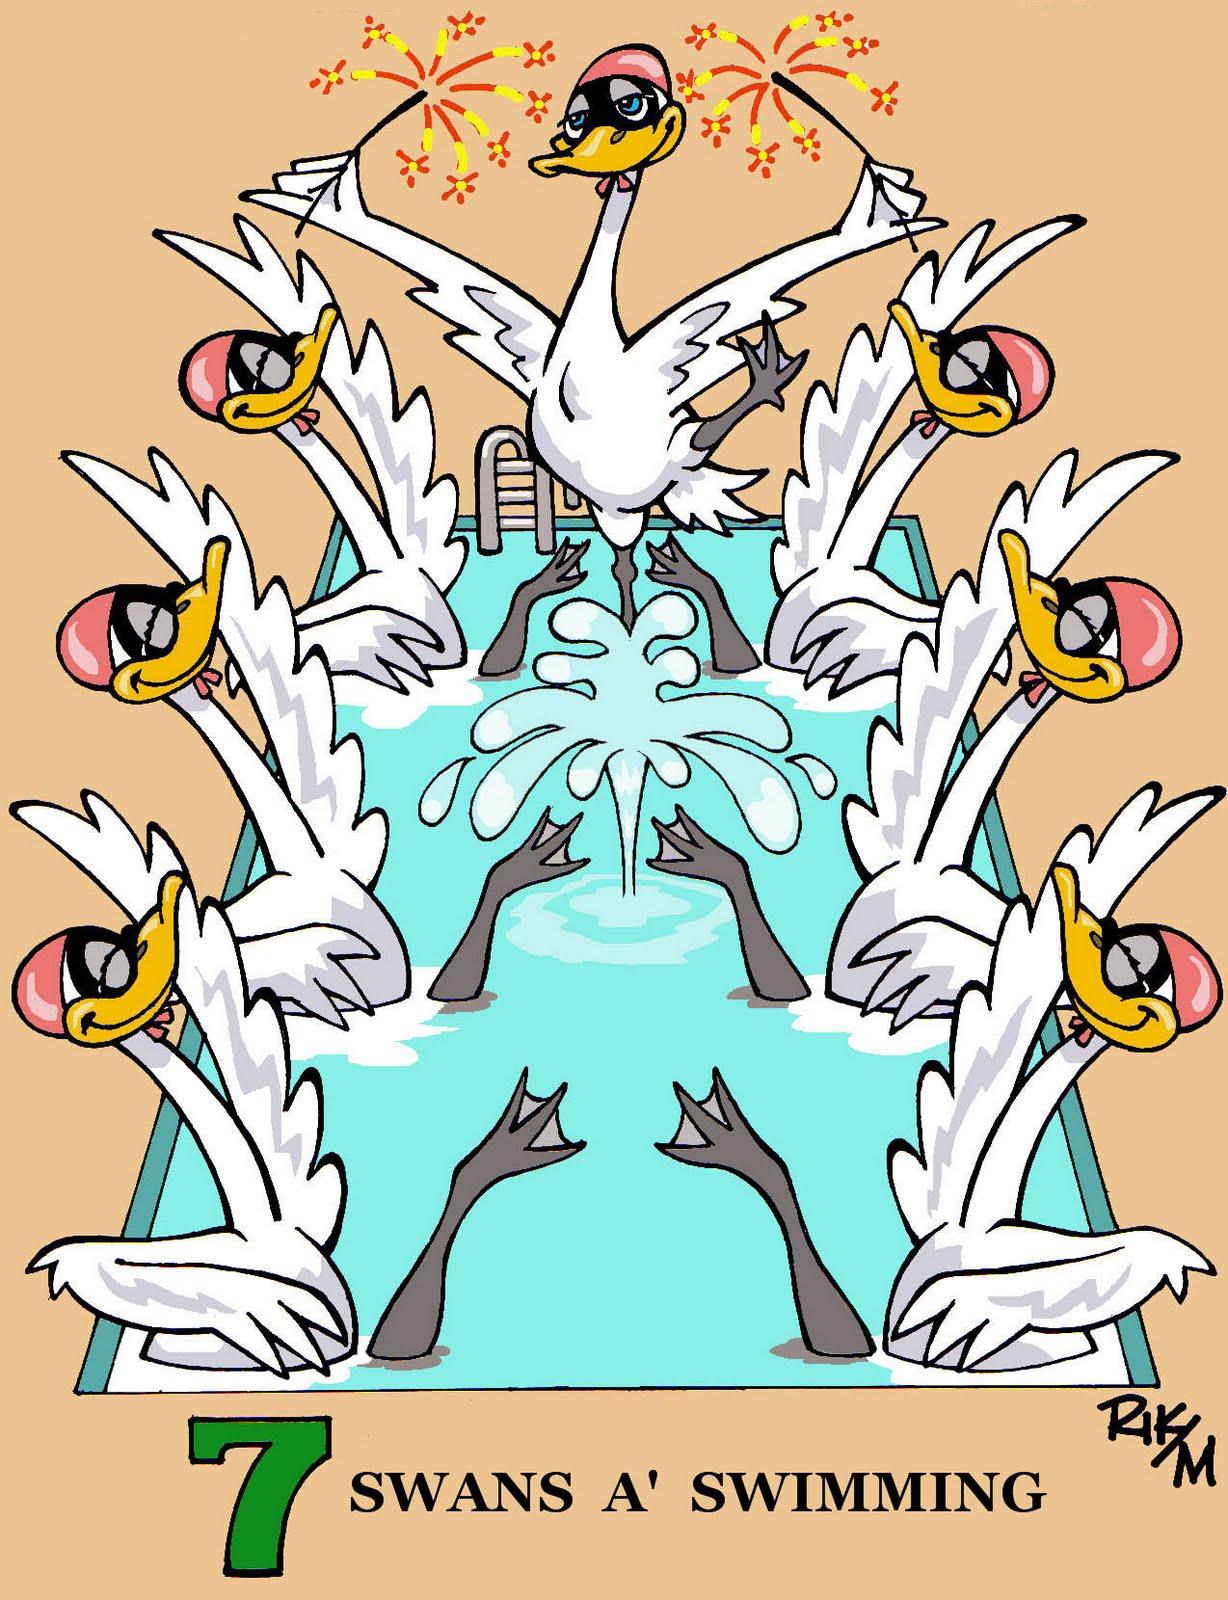 Riktoonz -- Cartoonist/Caricaturist Rick C. Moore: On the 5th, 6th ...